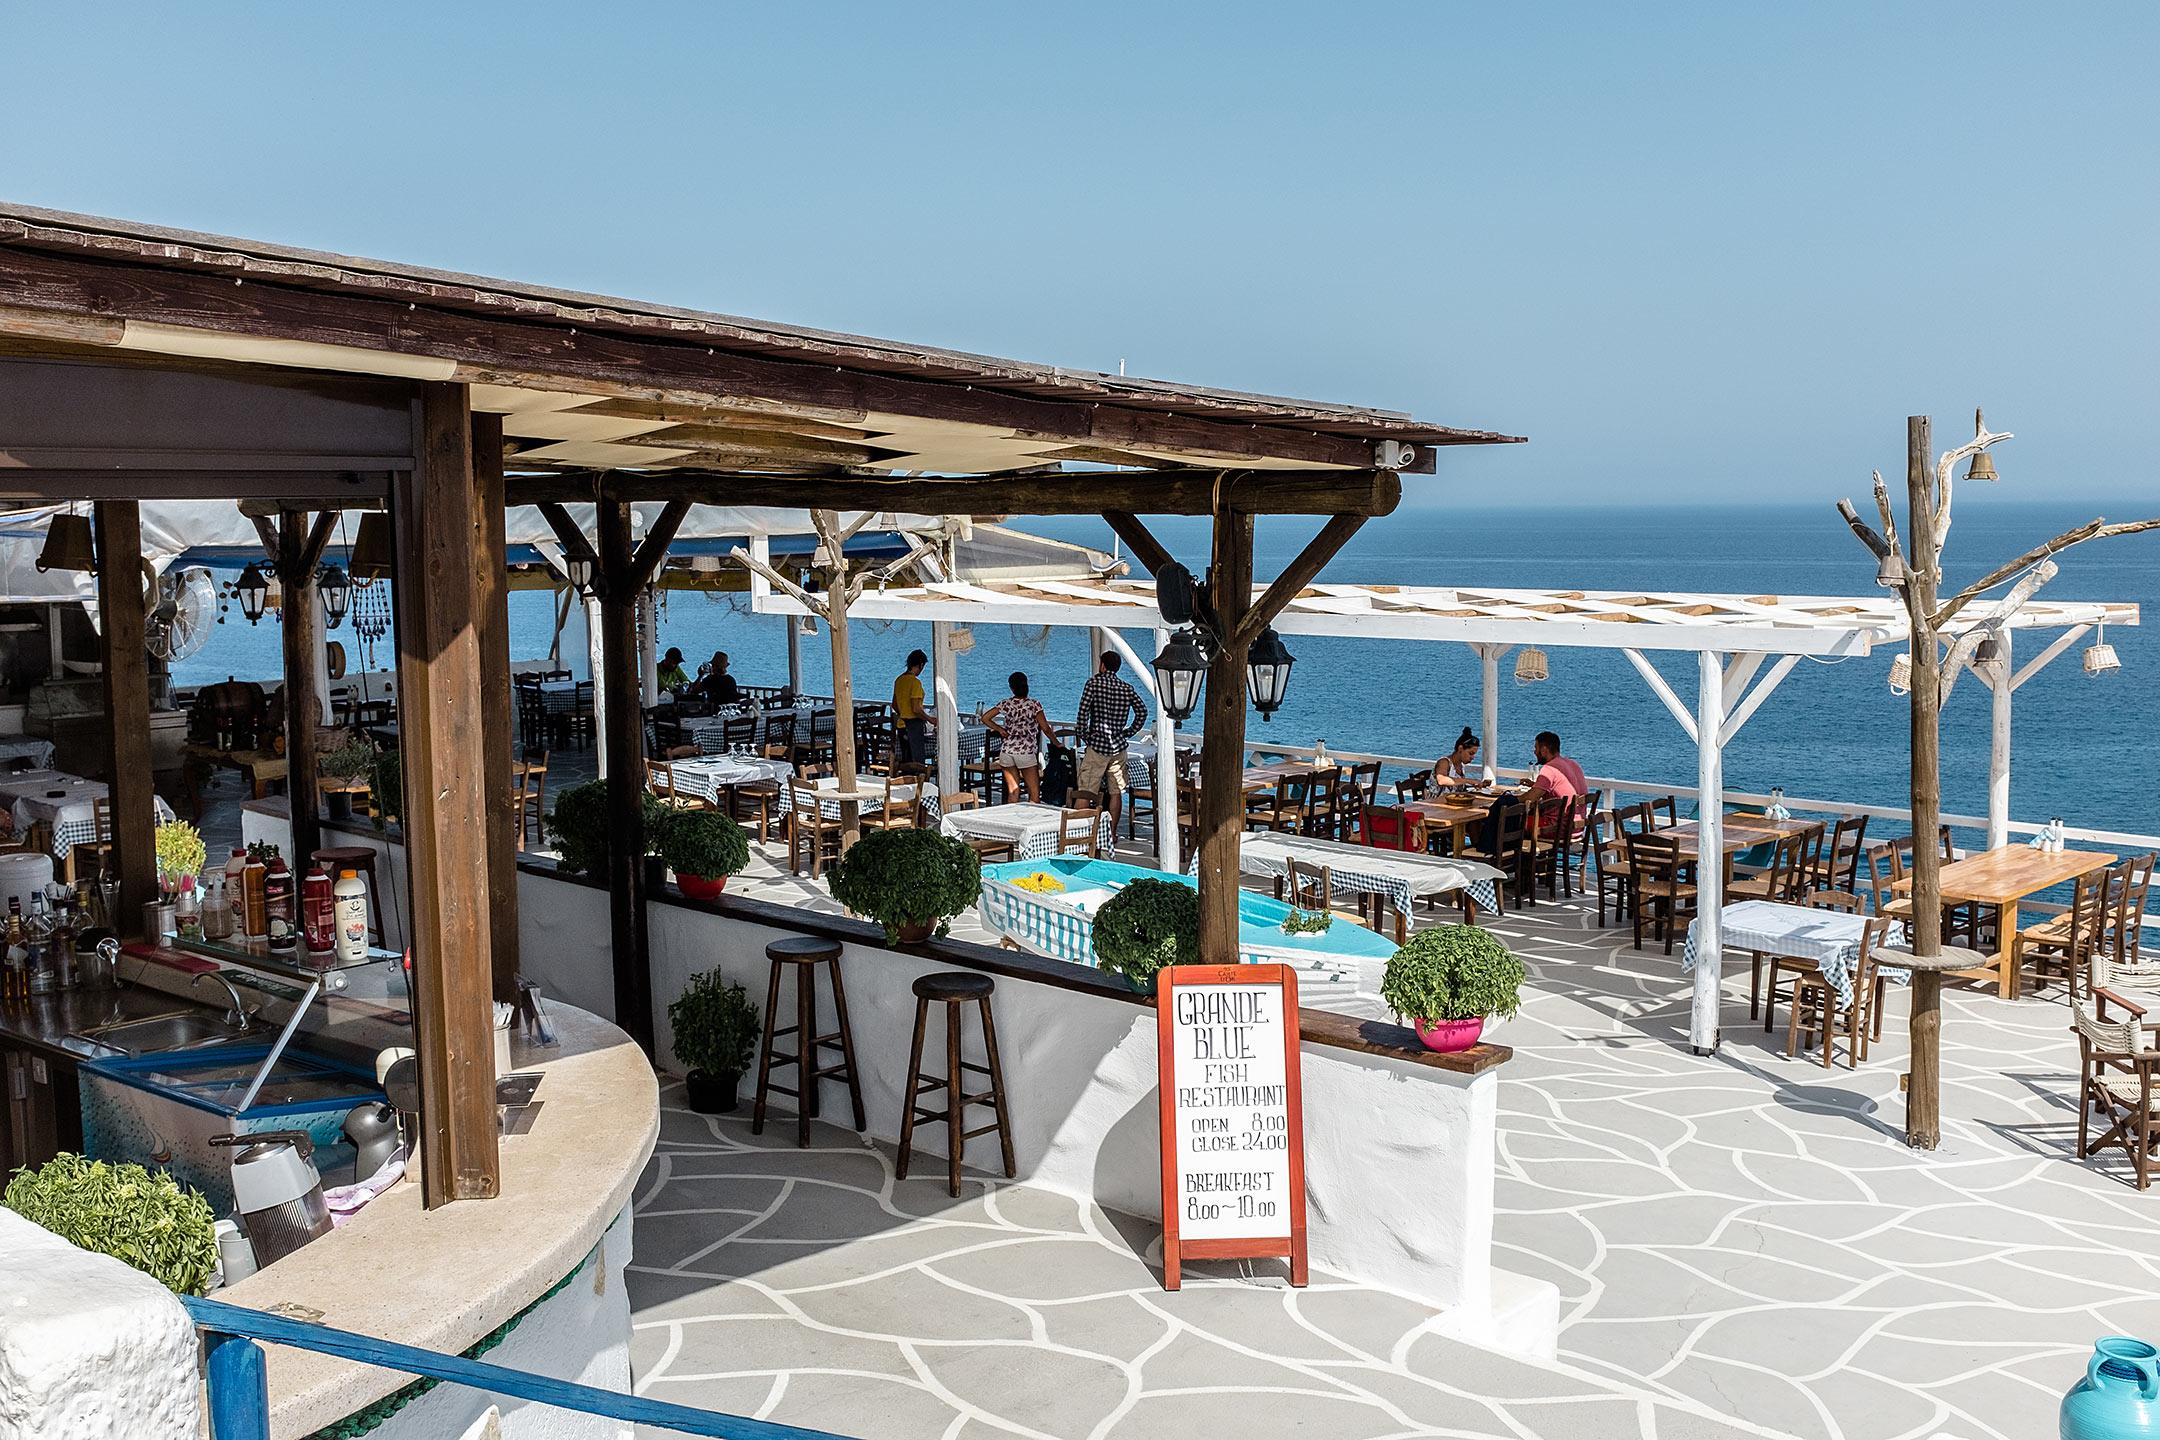 Grande Blue Restaurant Rhodos Stegna Geheimtipp Griechenland Travel Blog Sunnyinga